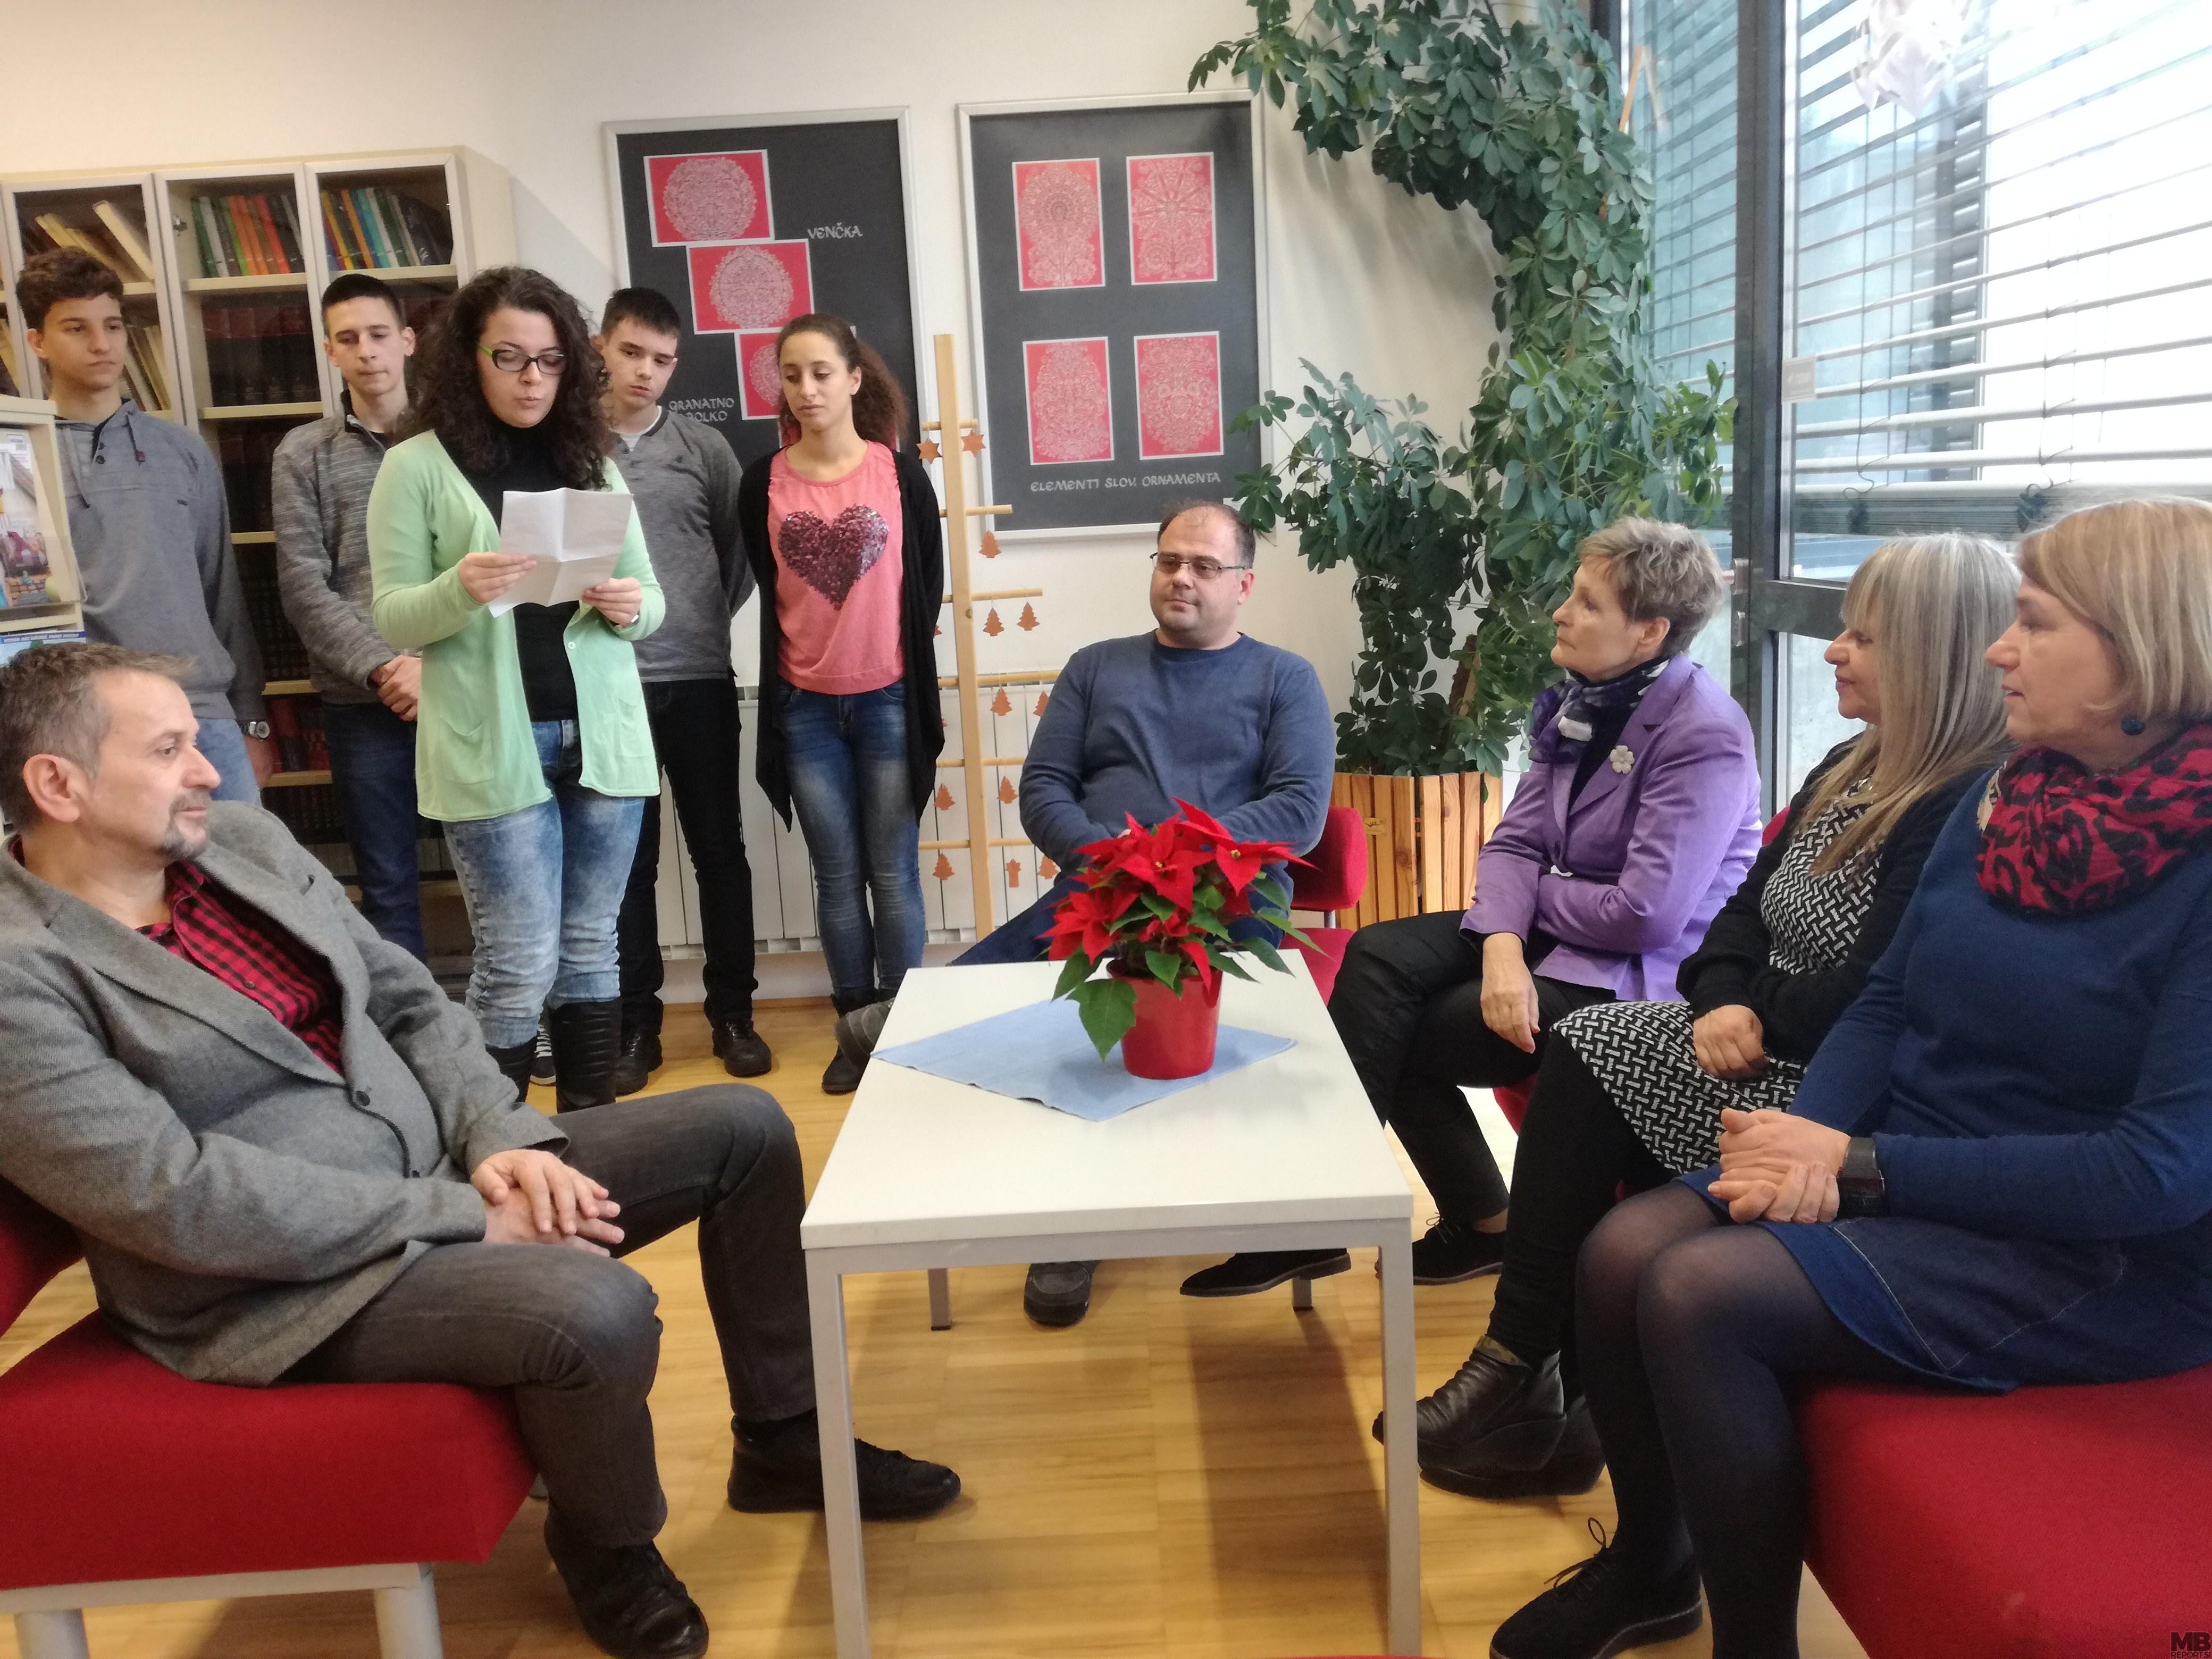 Gostujoča dijakinja Žana Marijana Prokić je zbranim prebrala svojo pesem, ki jo je napisala v času obiska v Mariboru.